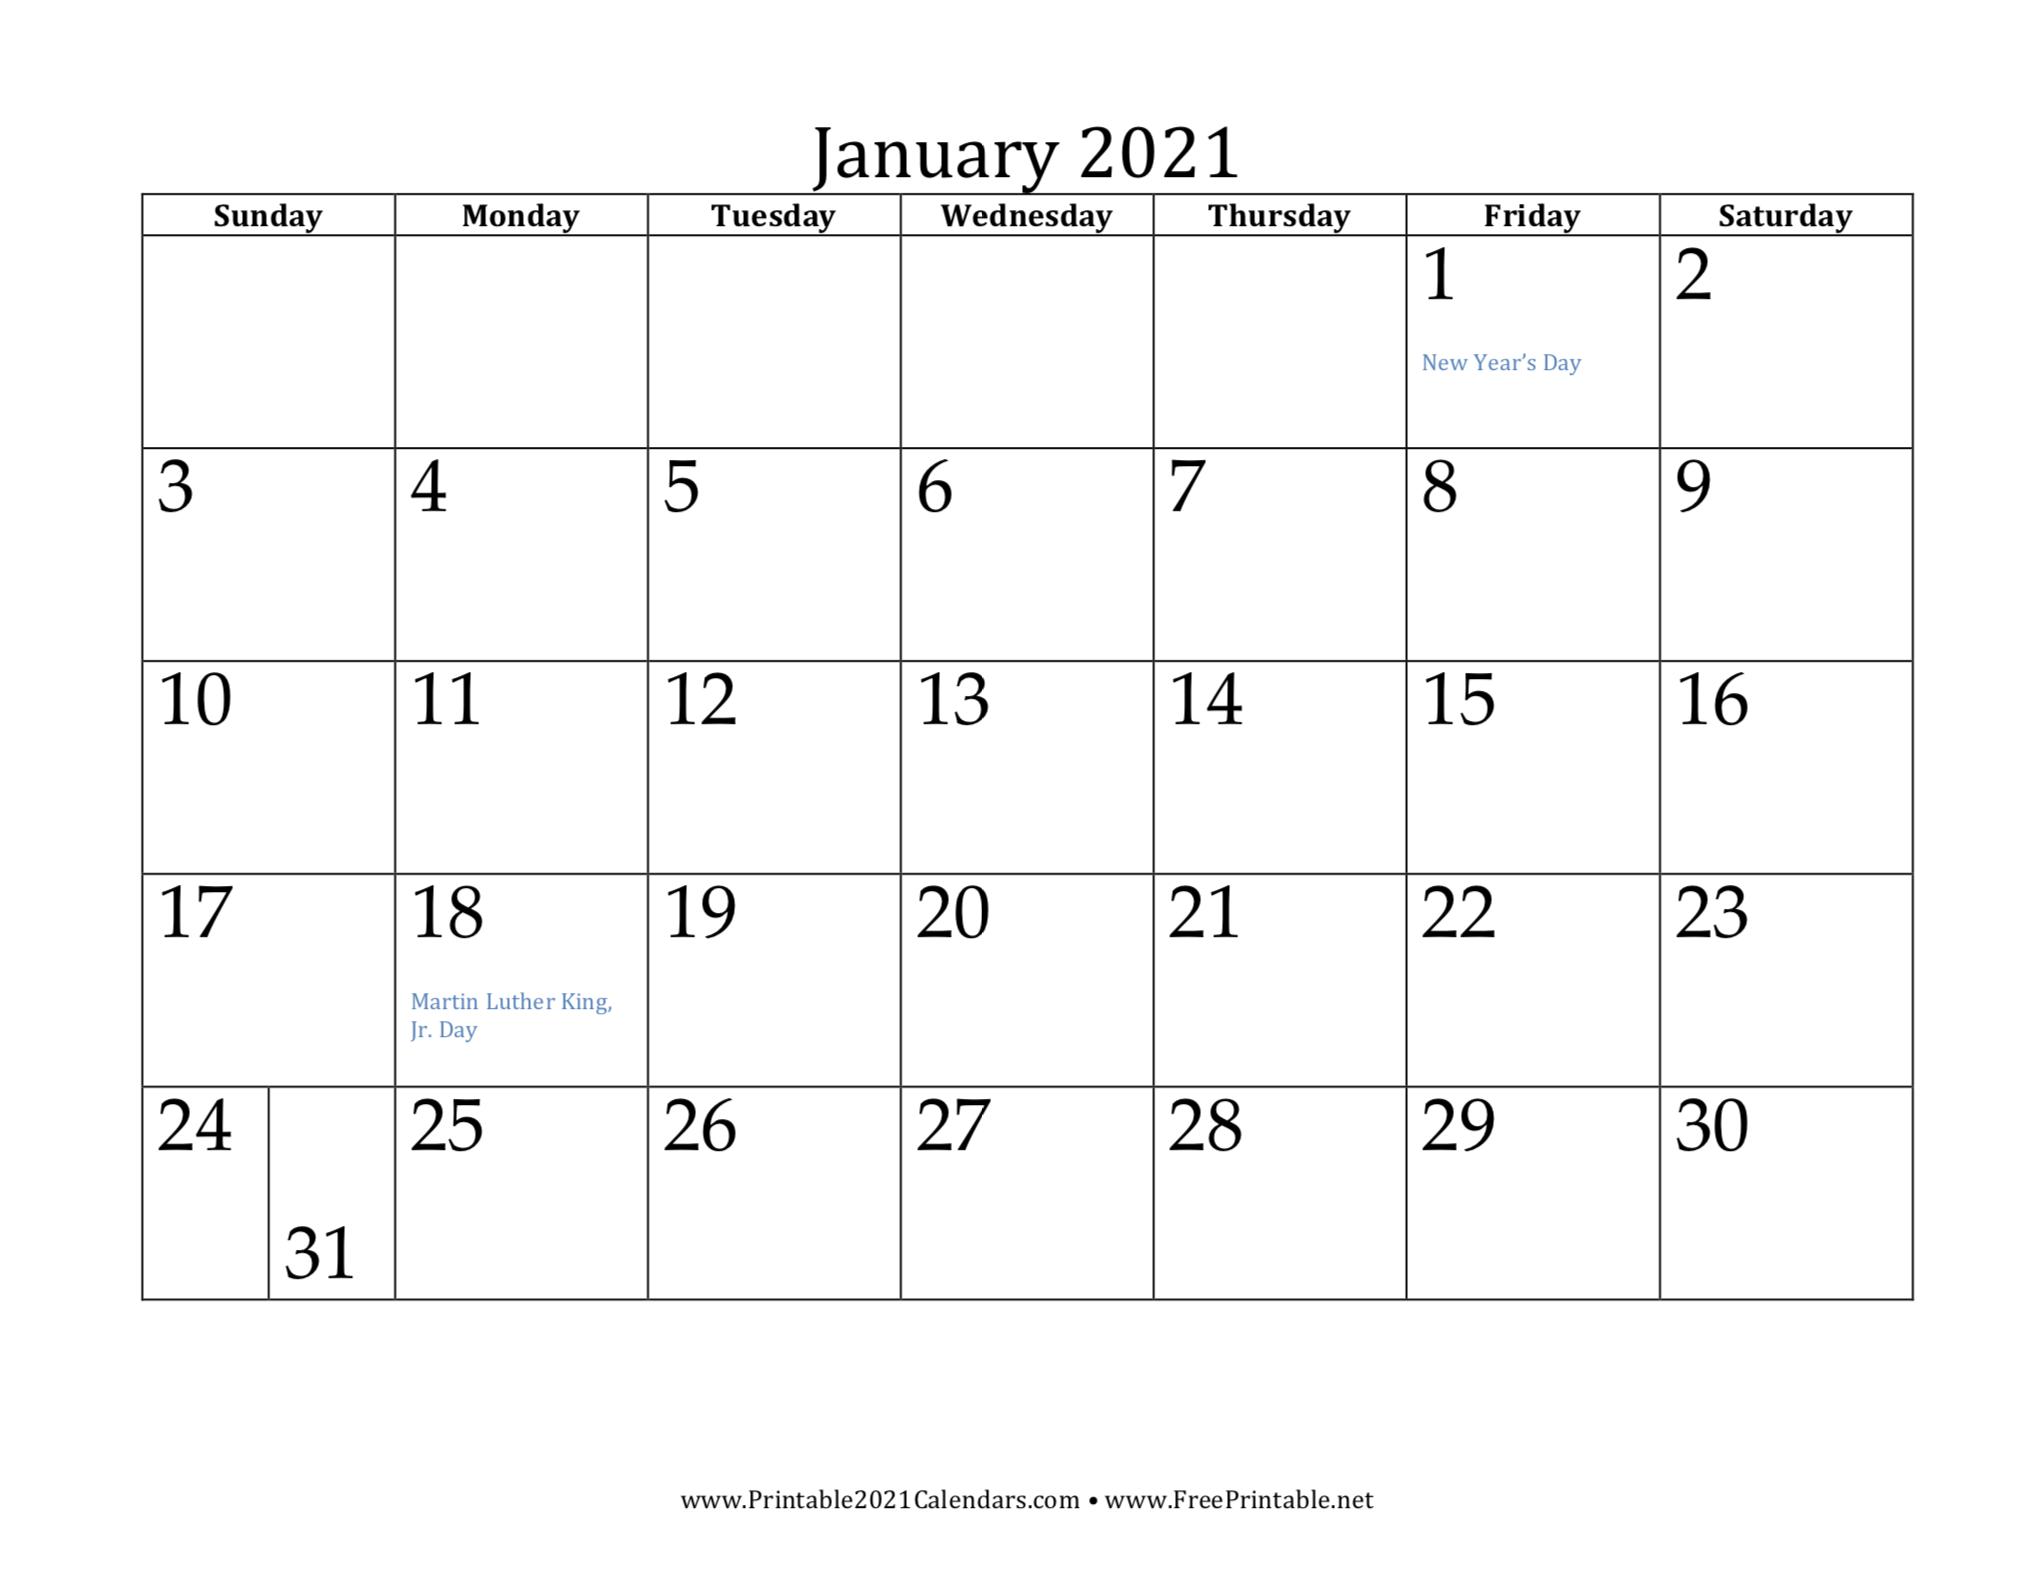 Free Printable 2021 Calendars Free Printables